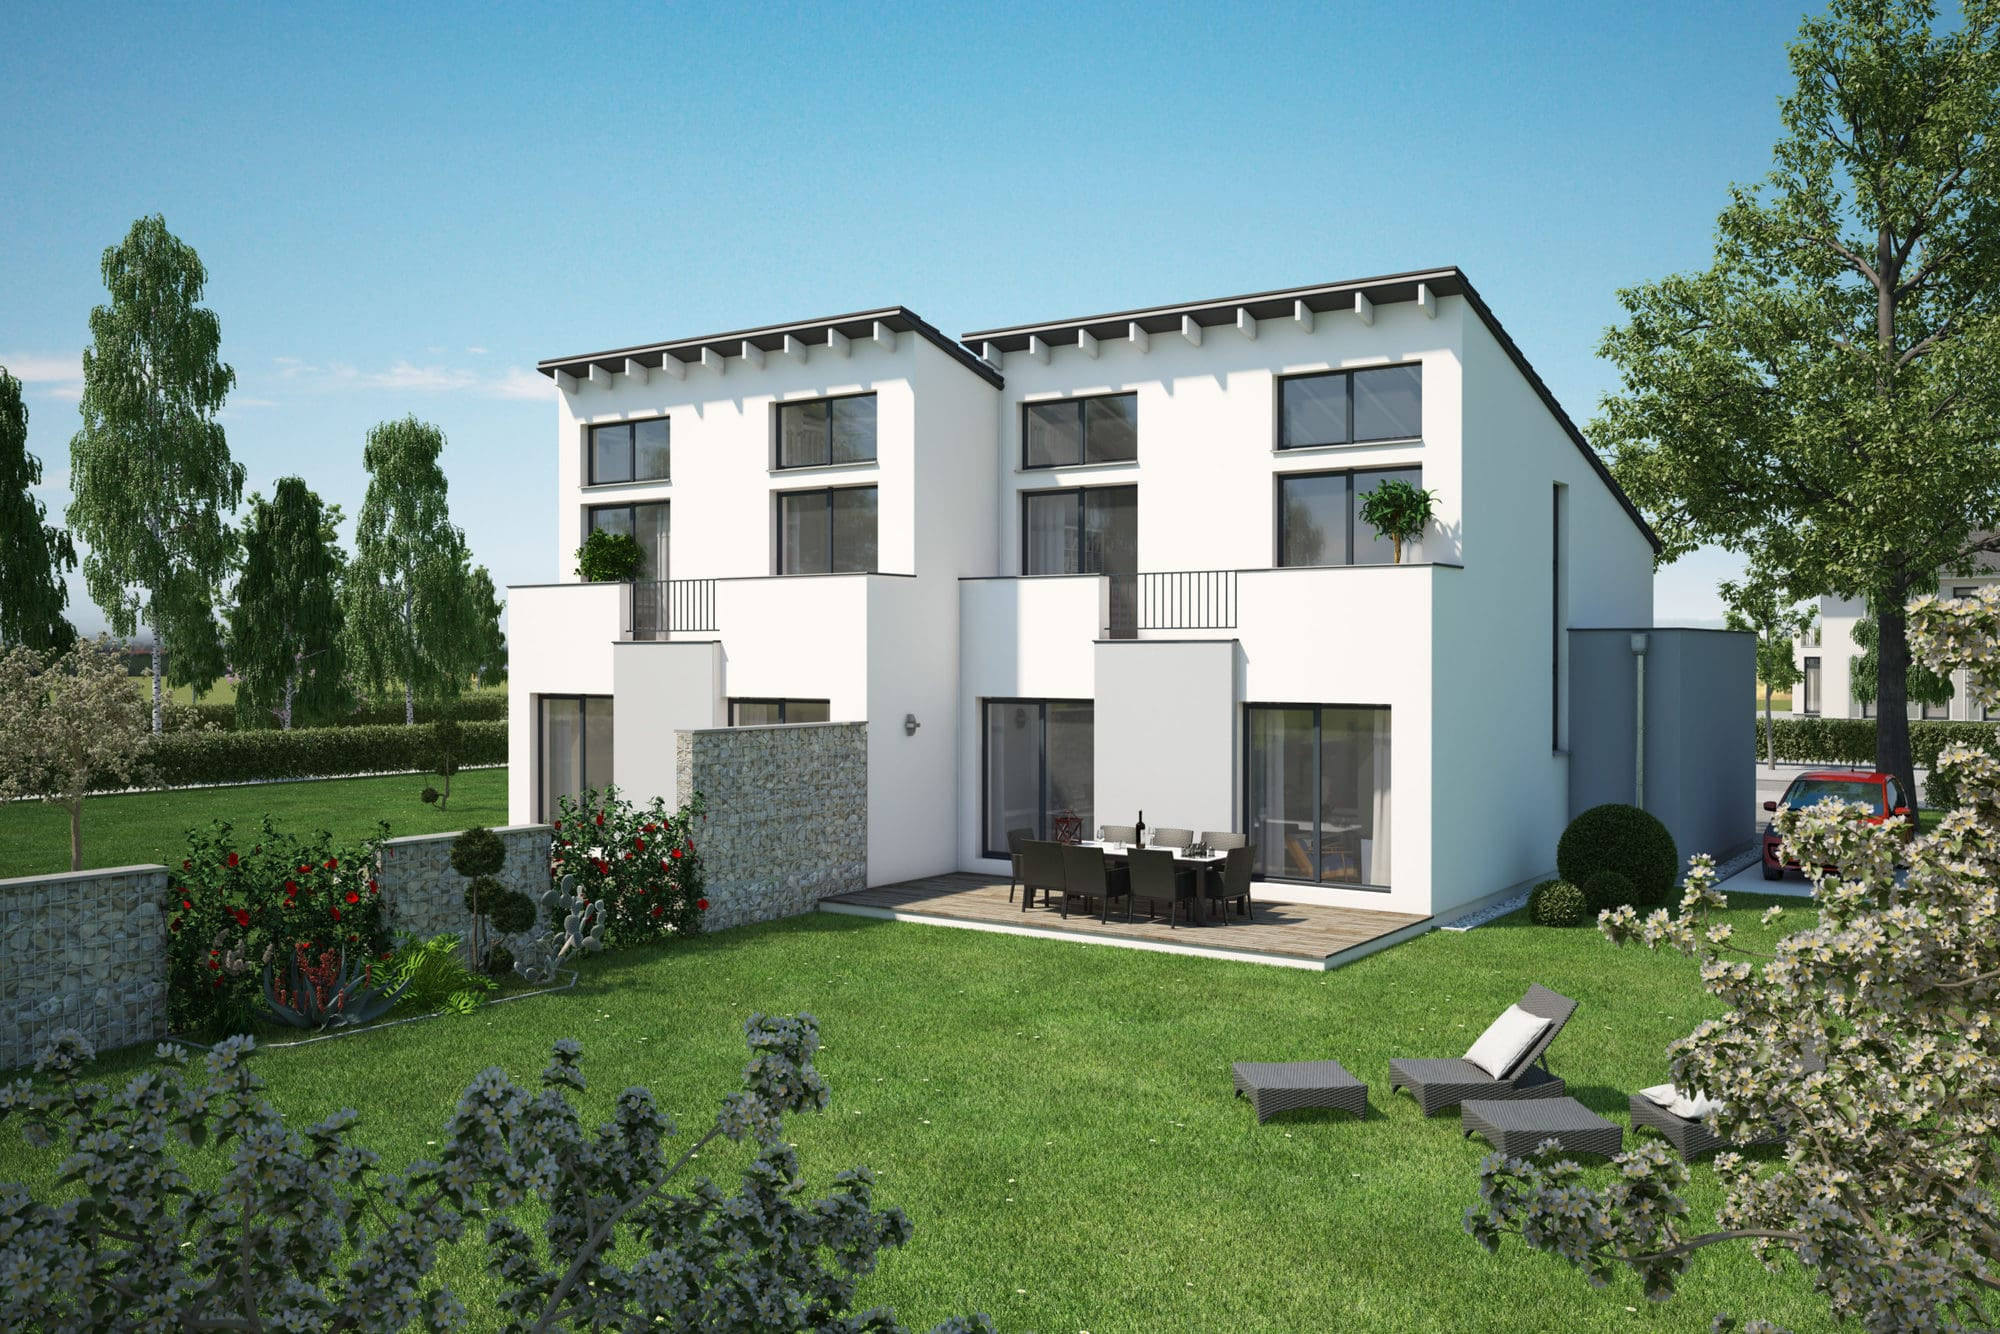 doppelhaus-pultdach-3